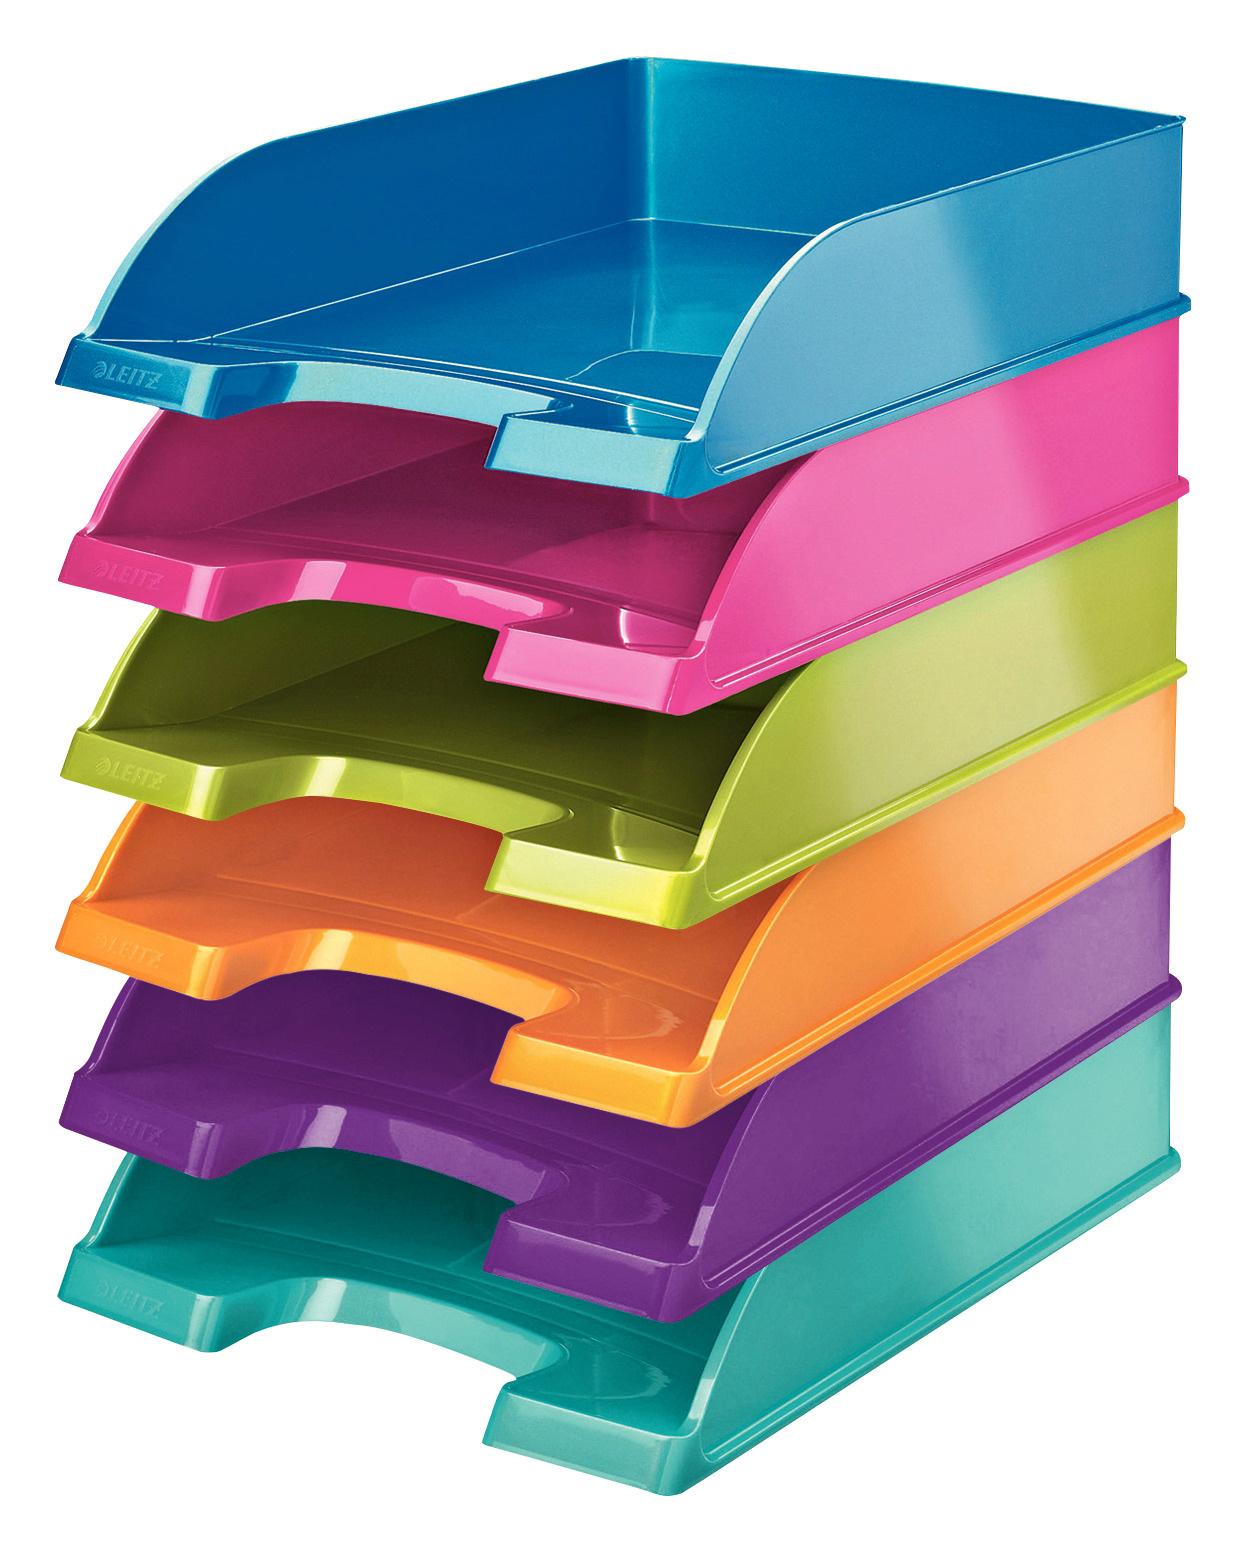 Лоток горизонтальный Wow, метал., пурпур. LEITZ - фото 6